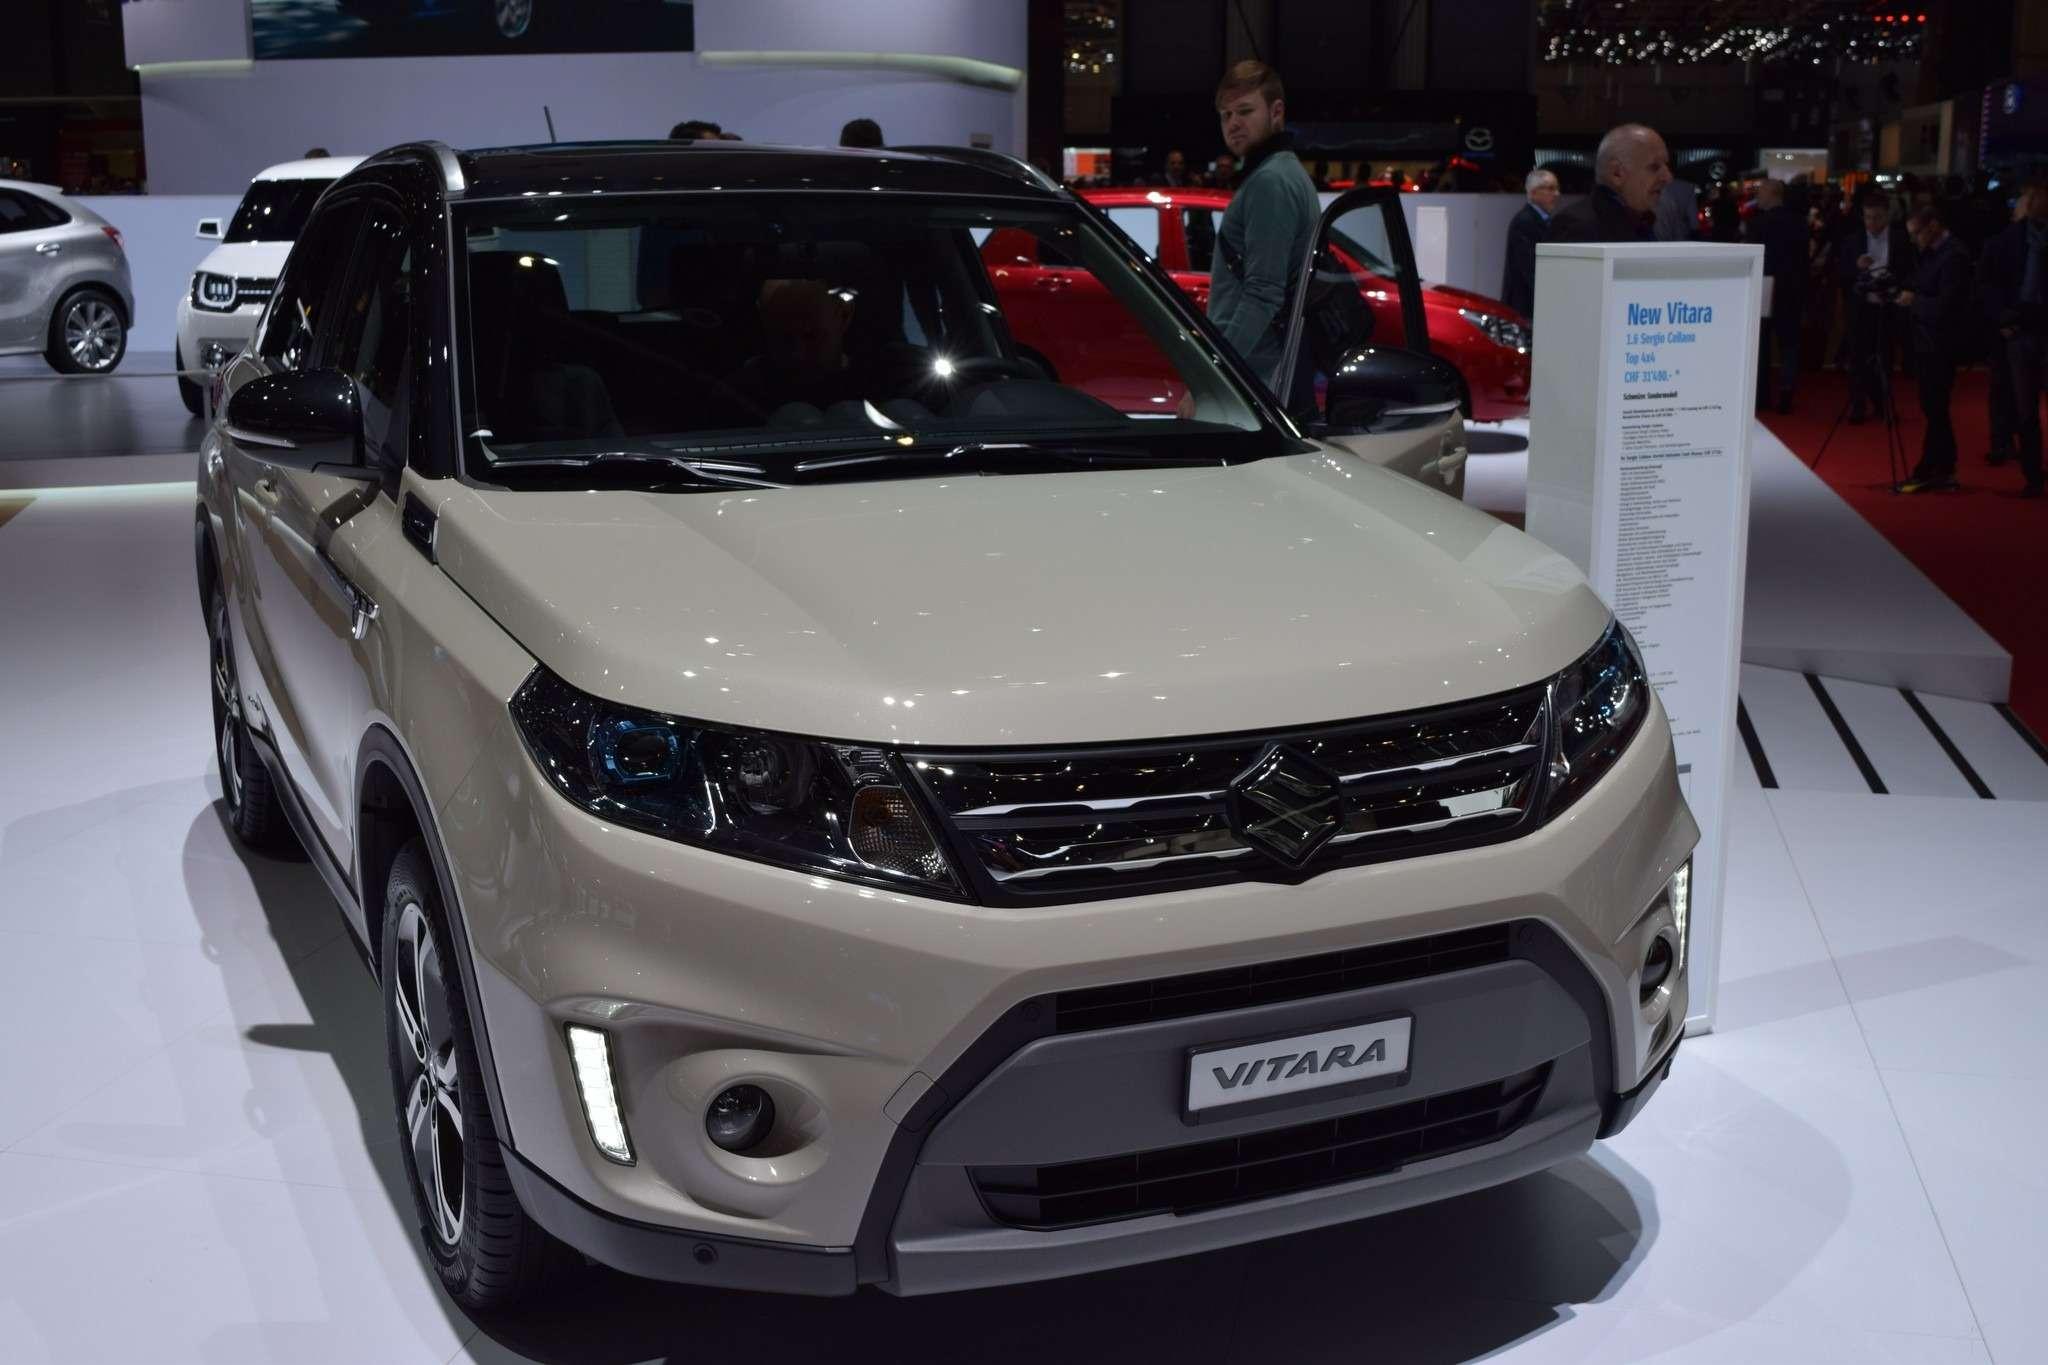 Suzuki предложит новую Vitara вРФпоцене менее 1млн руб.— фото 368909